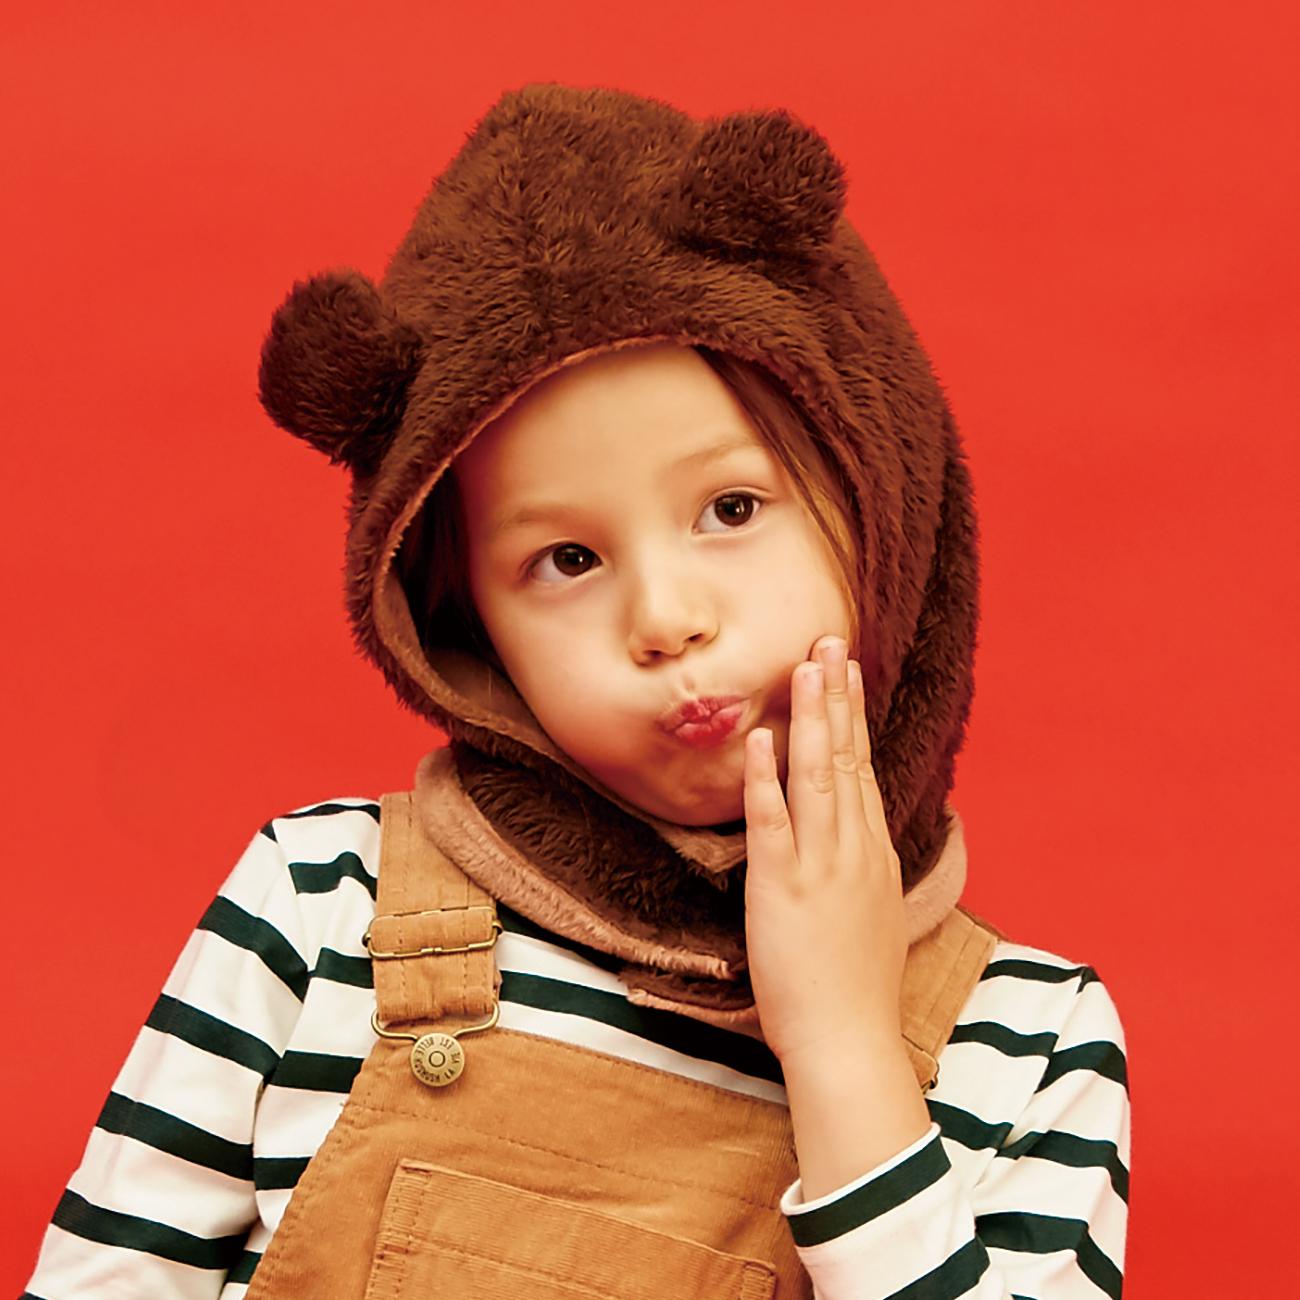 【HusHusH(Kids) (ハッシュアッシュ)】フェイスマスクキッズ 帽子|その他帽子 ブラウン